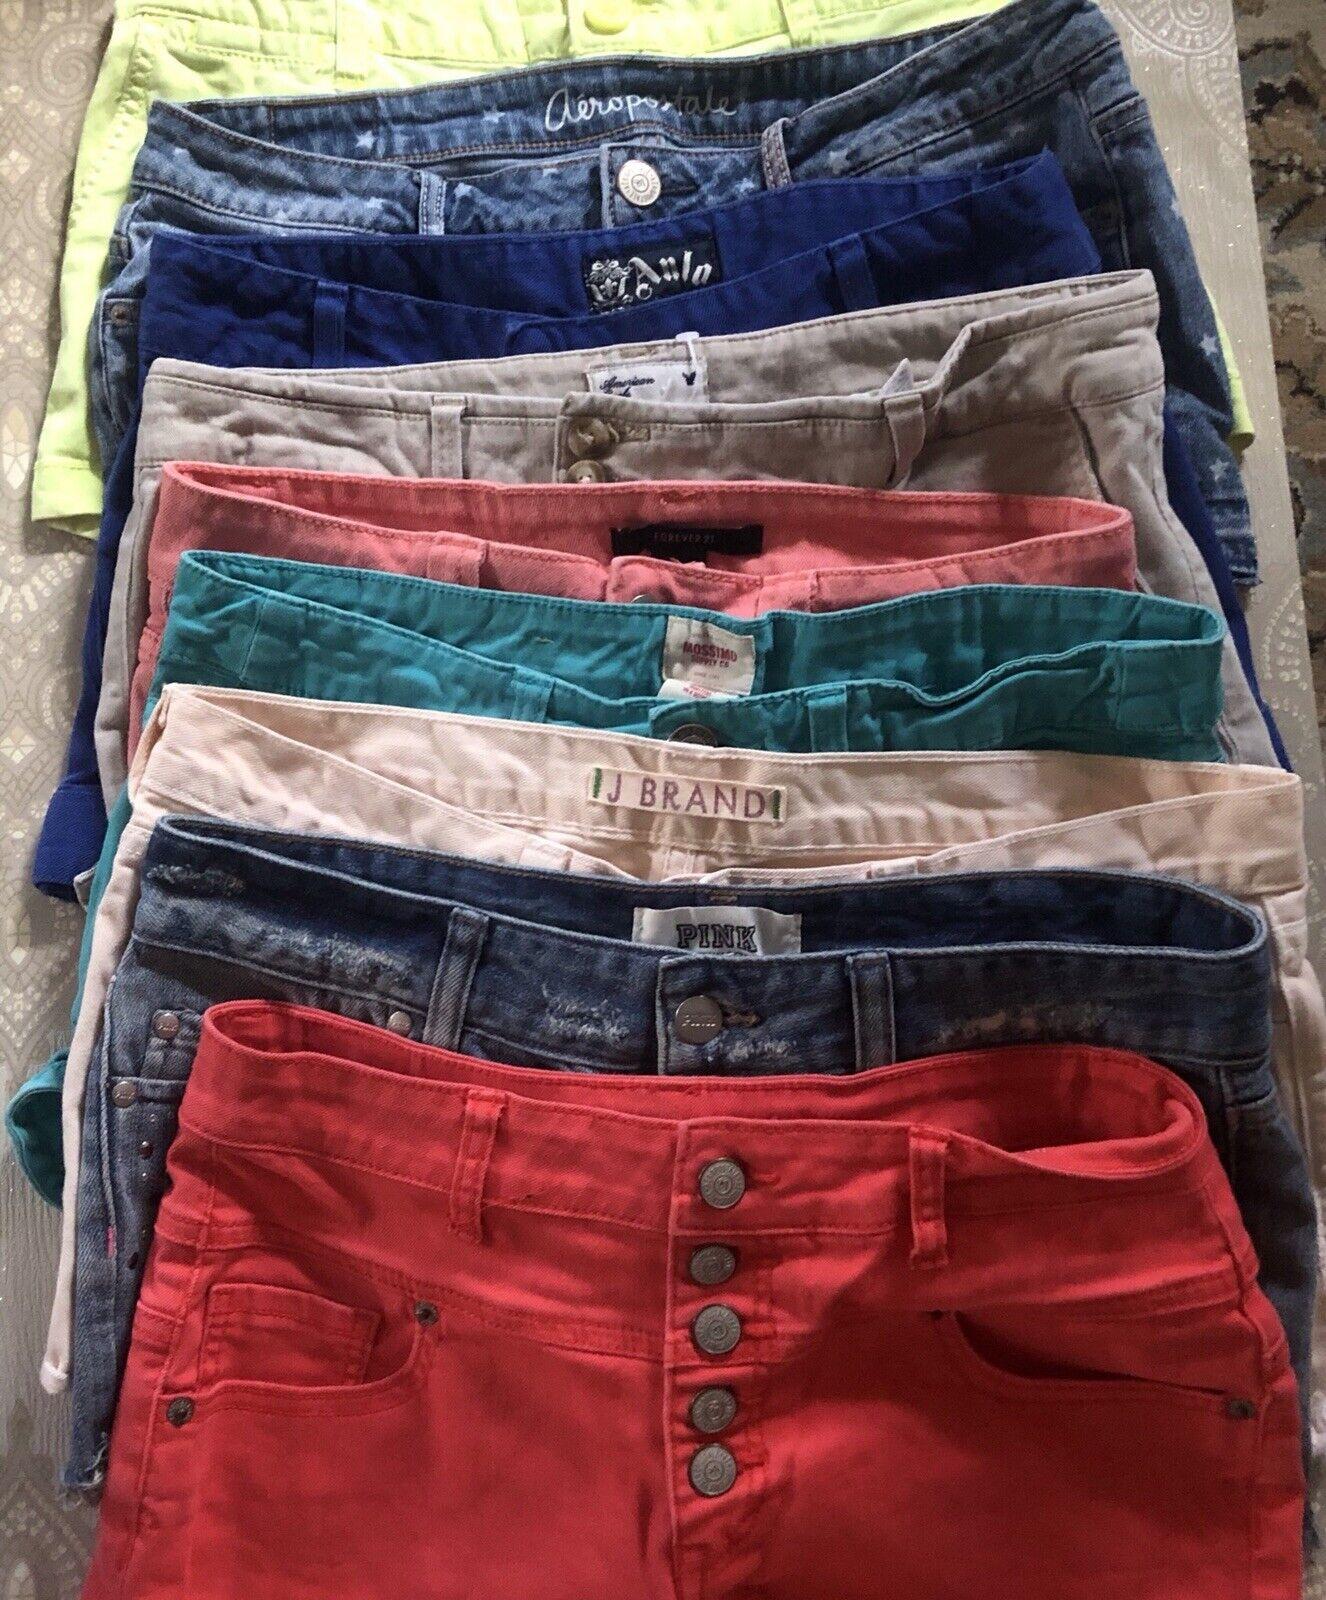 Bundle Shorts 9 Pairs Pink J Brand Anlo Aeropostal High Waisted Short Resellers